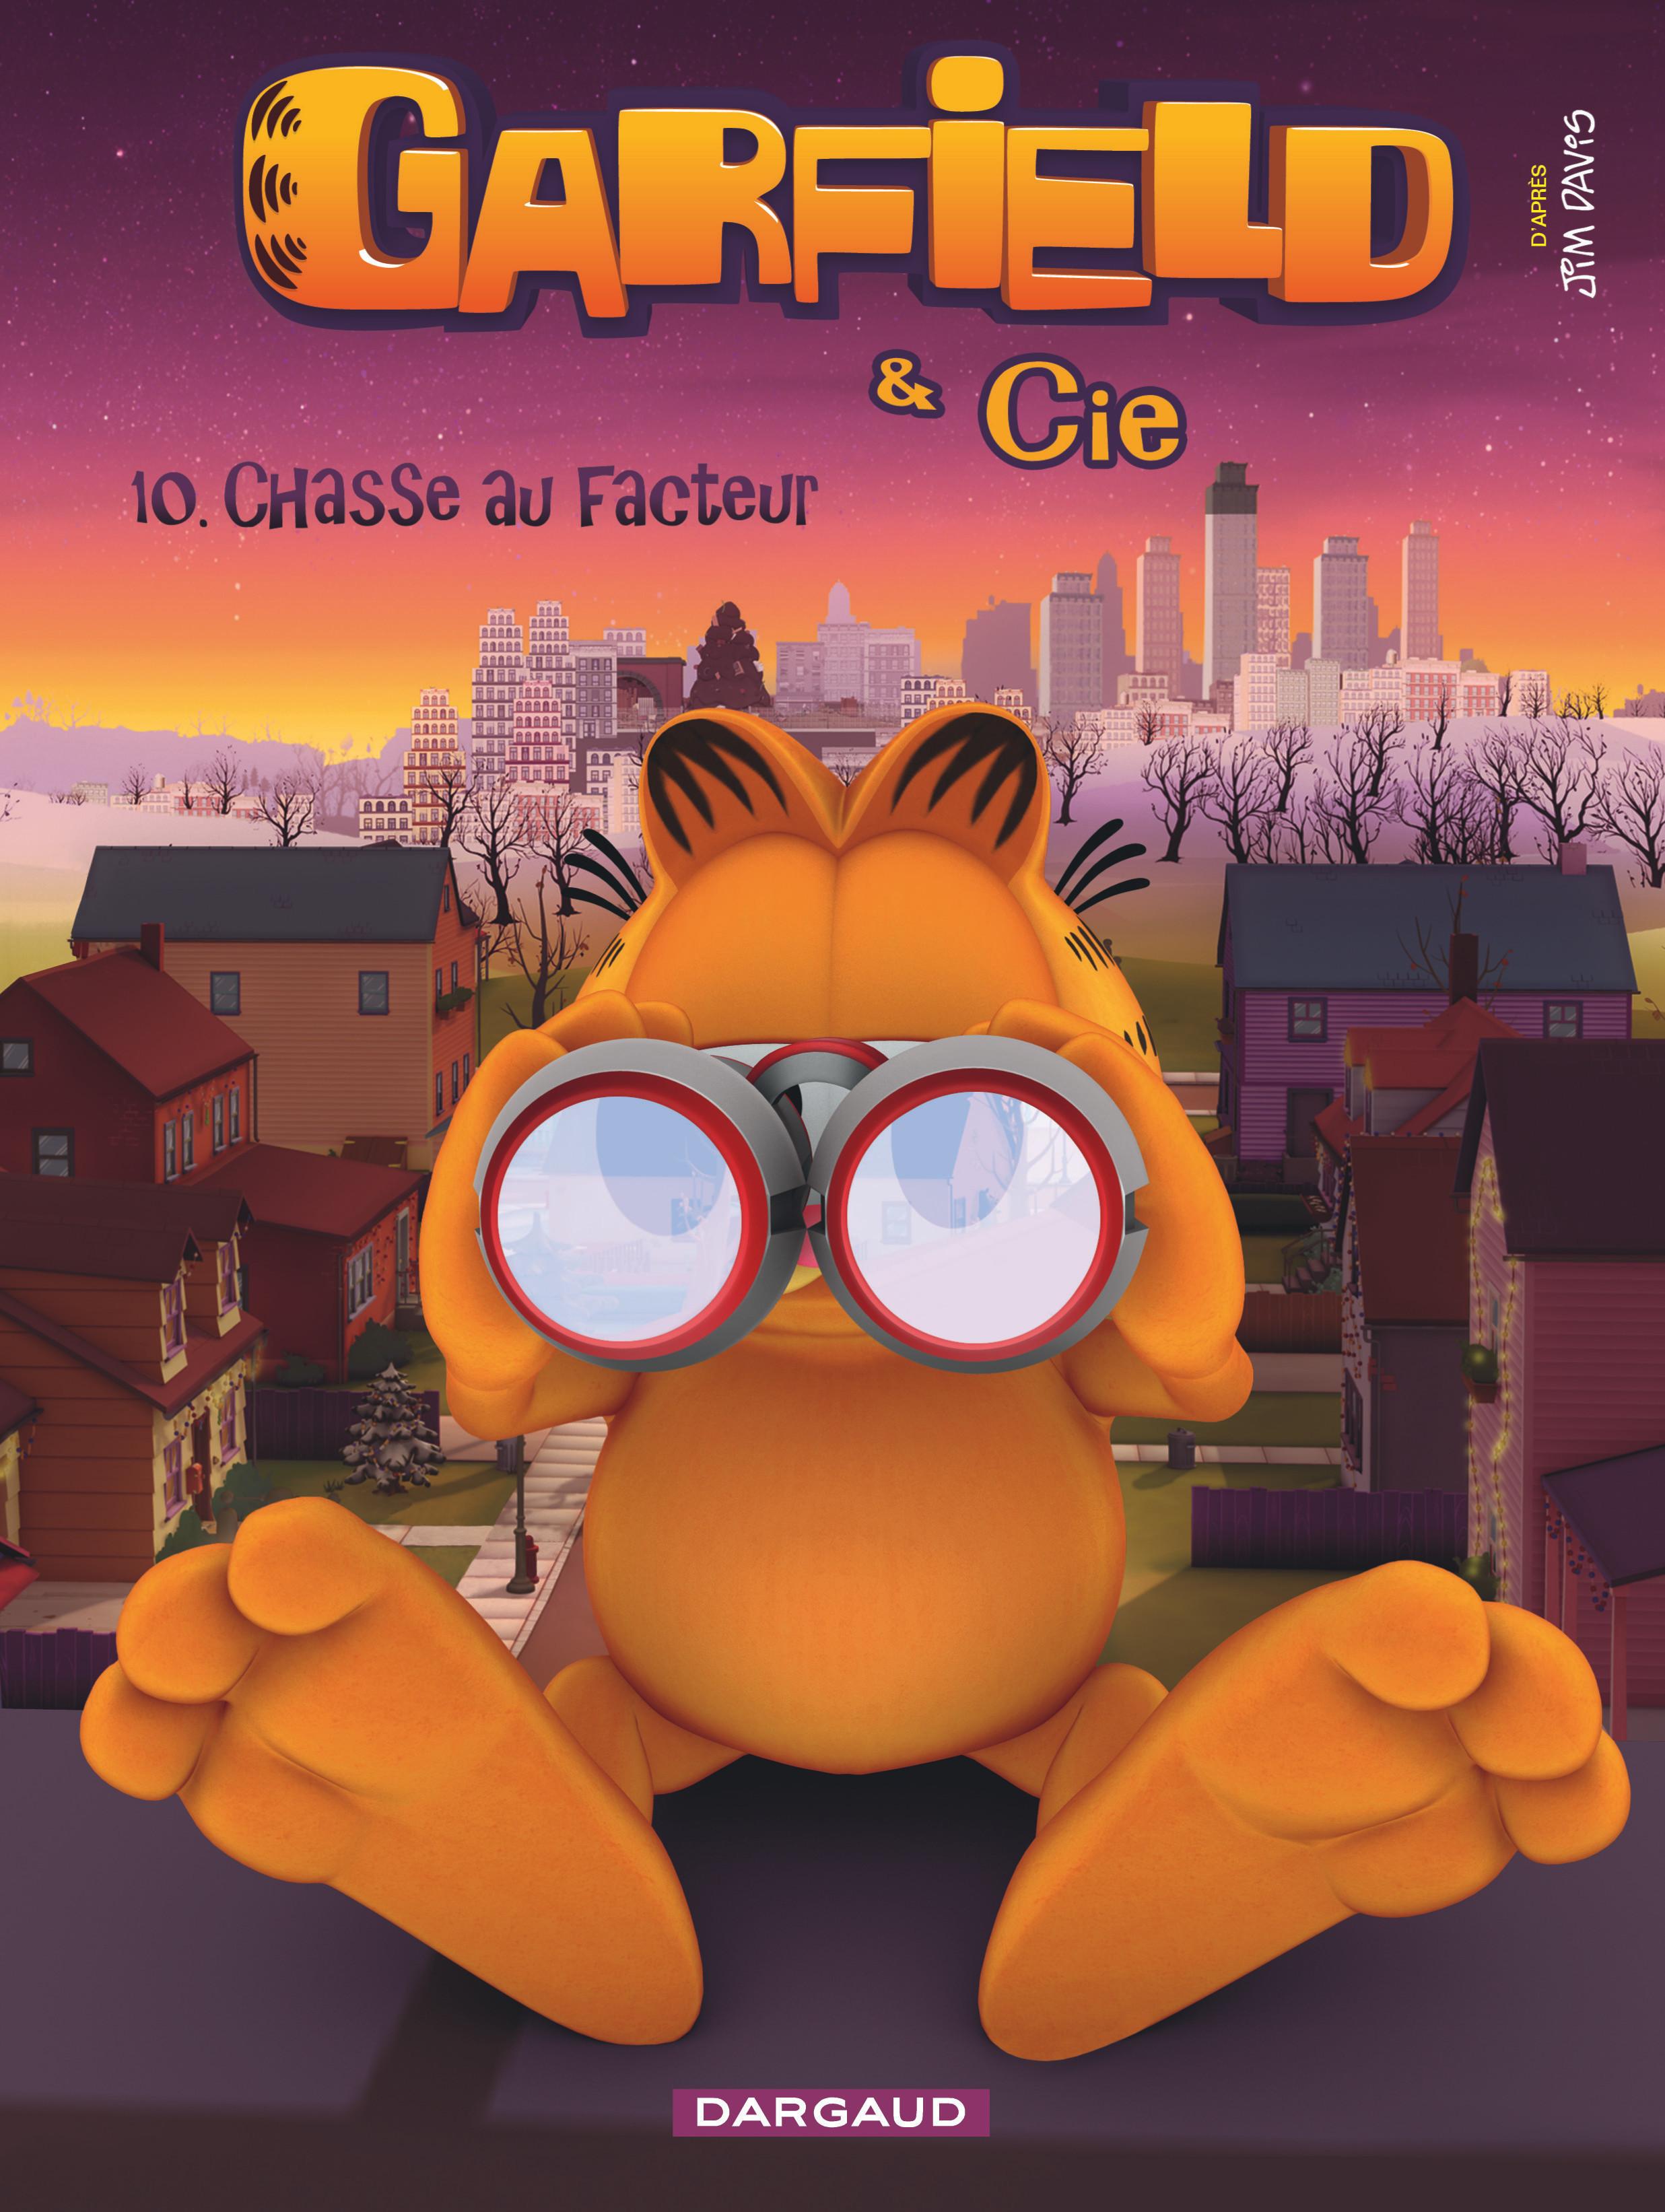 GARFIELD ET CIE - GARFIELD & CIE - TOME 10 - CHASSE AU FACTEUR (10)